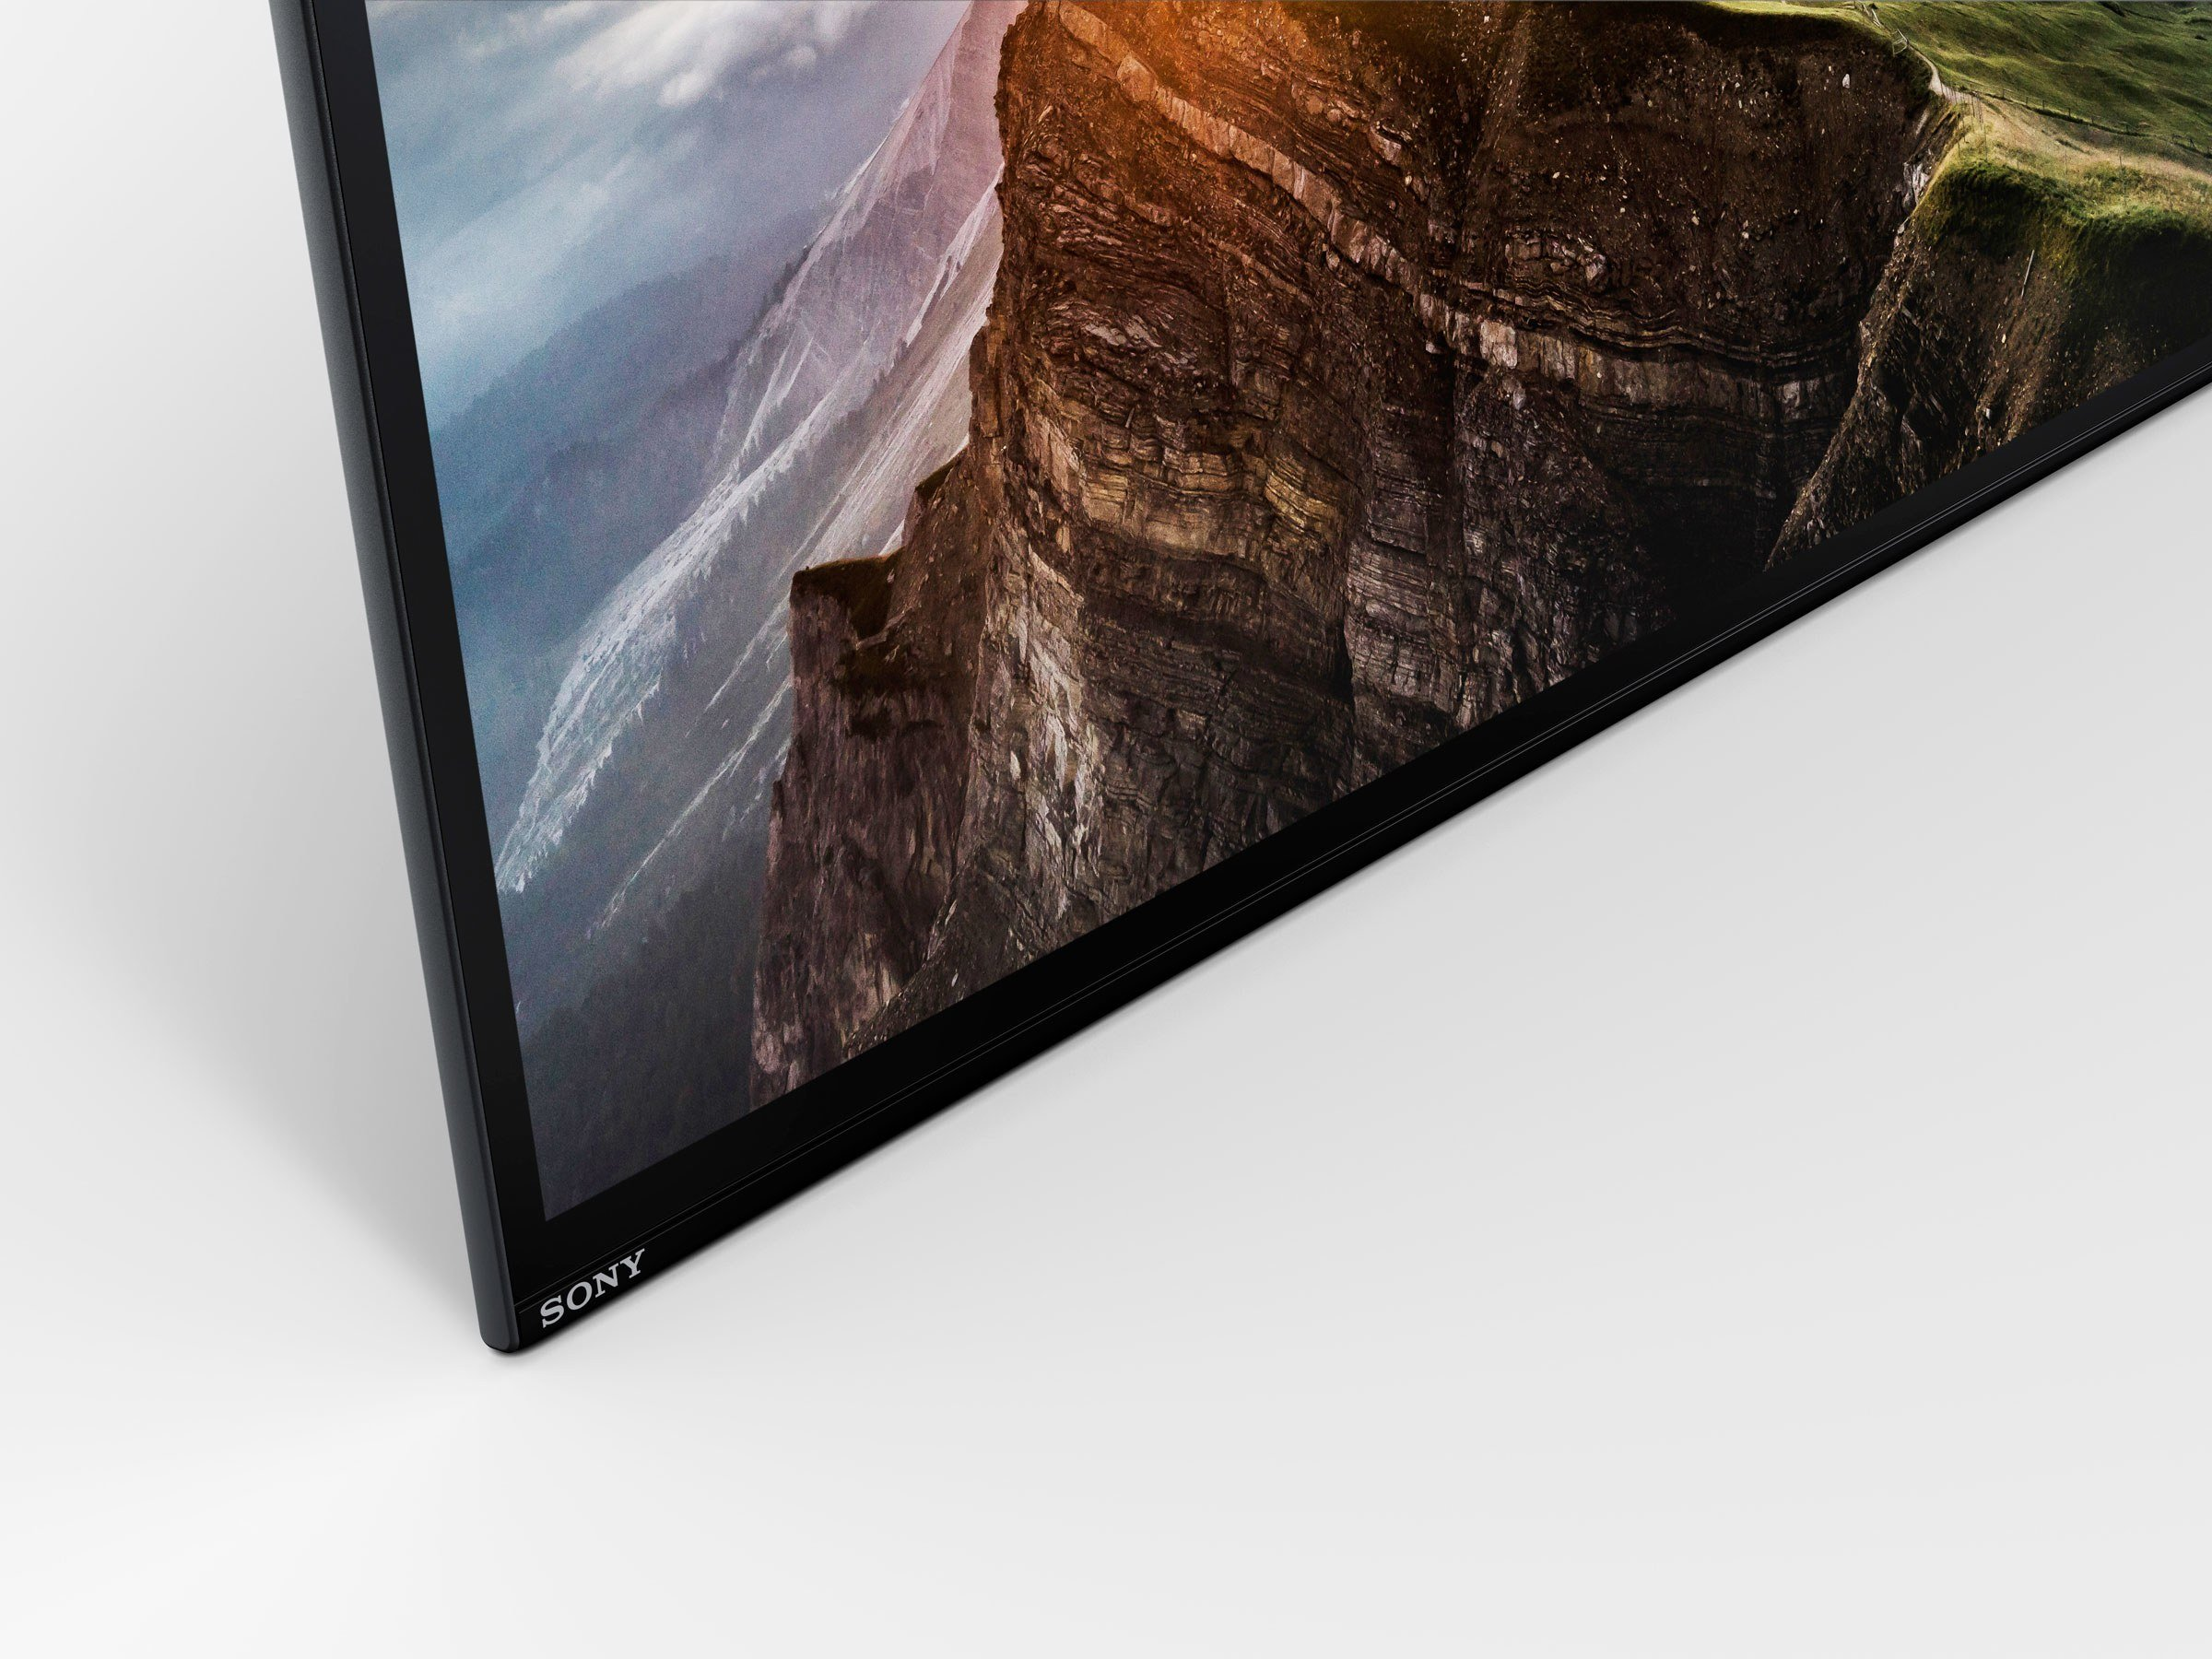 Sony A1 OLED closeup